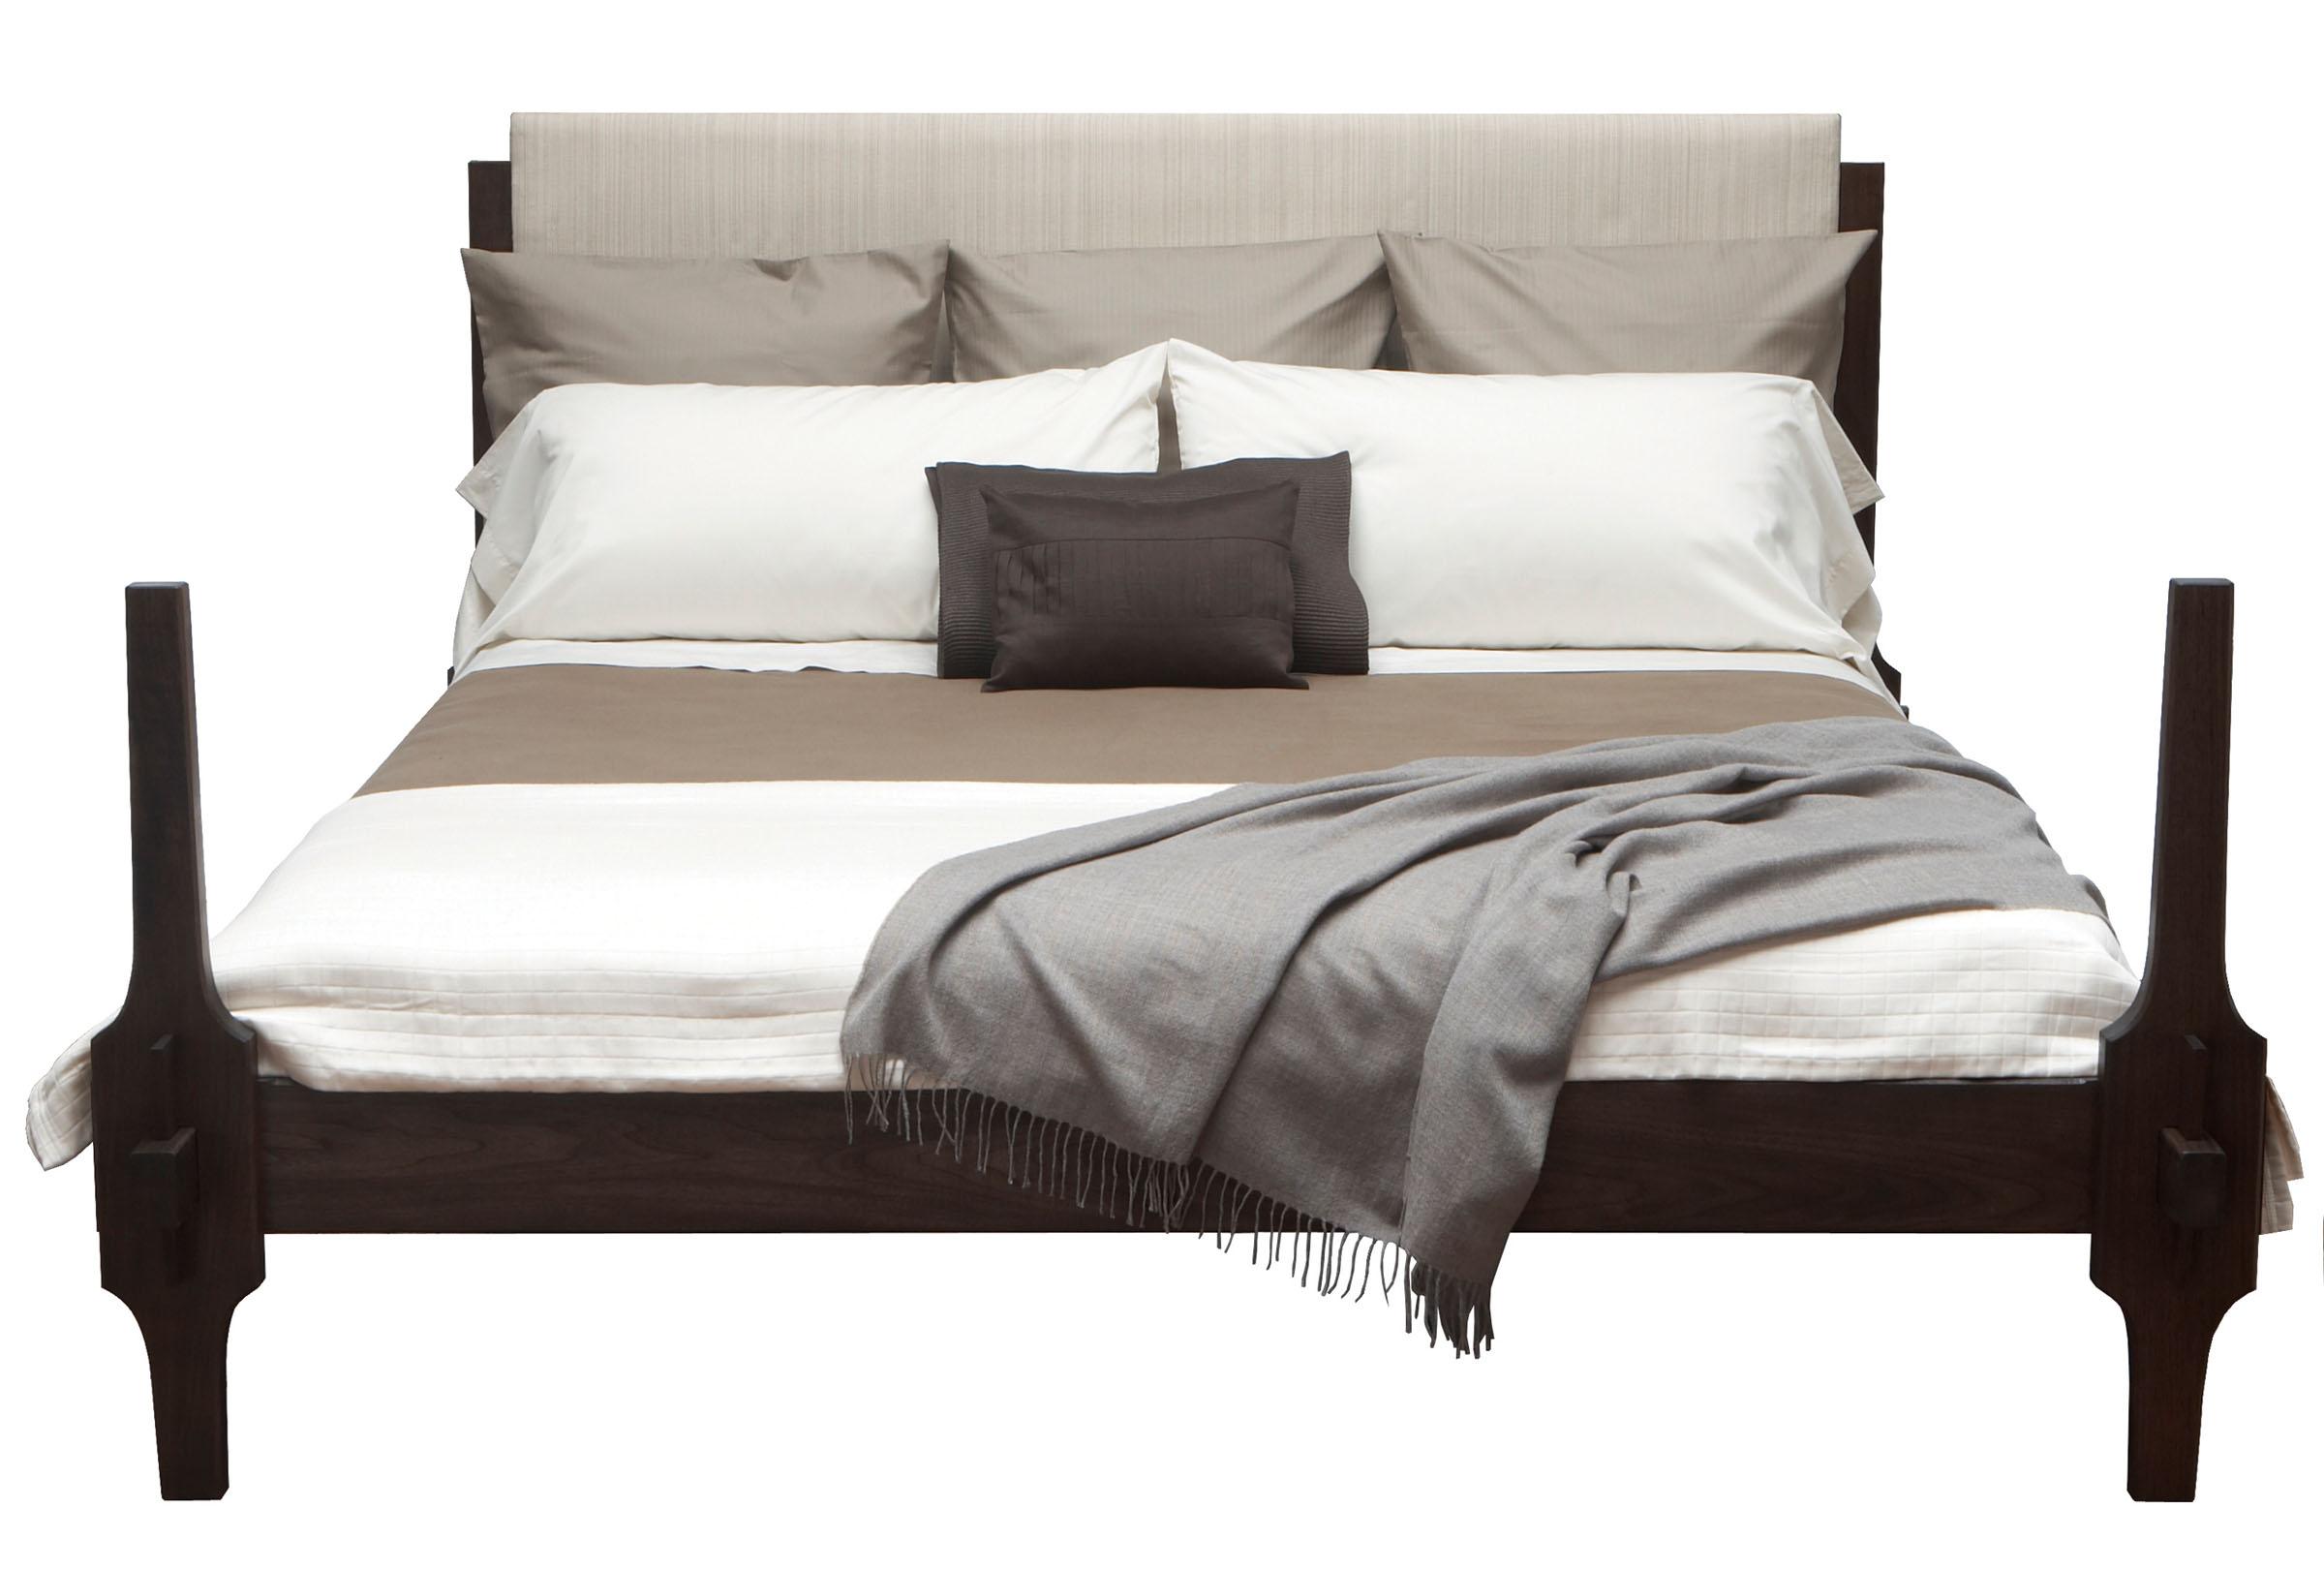 Greydon bed in walnut - maccassar stain